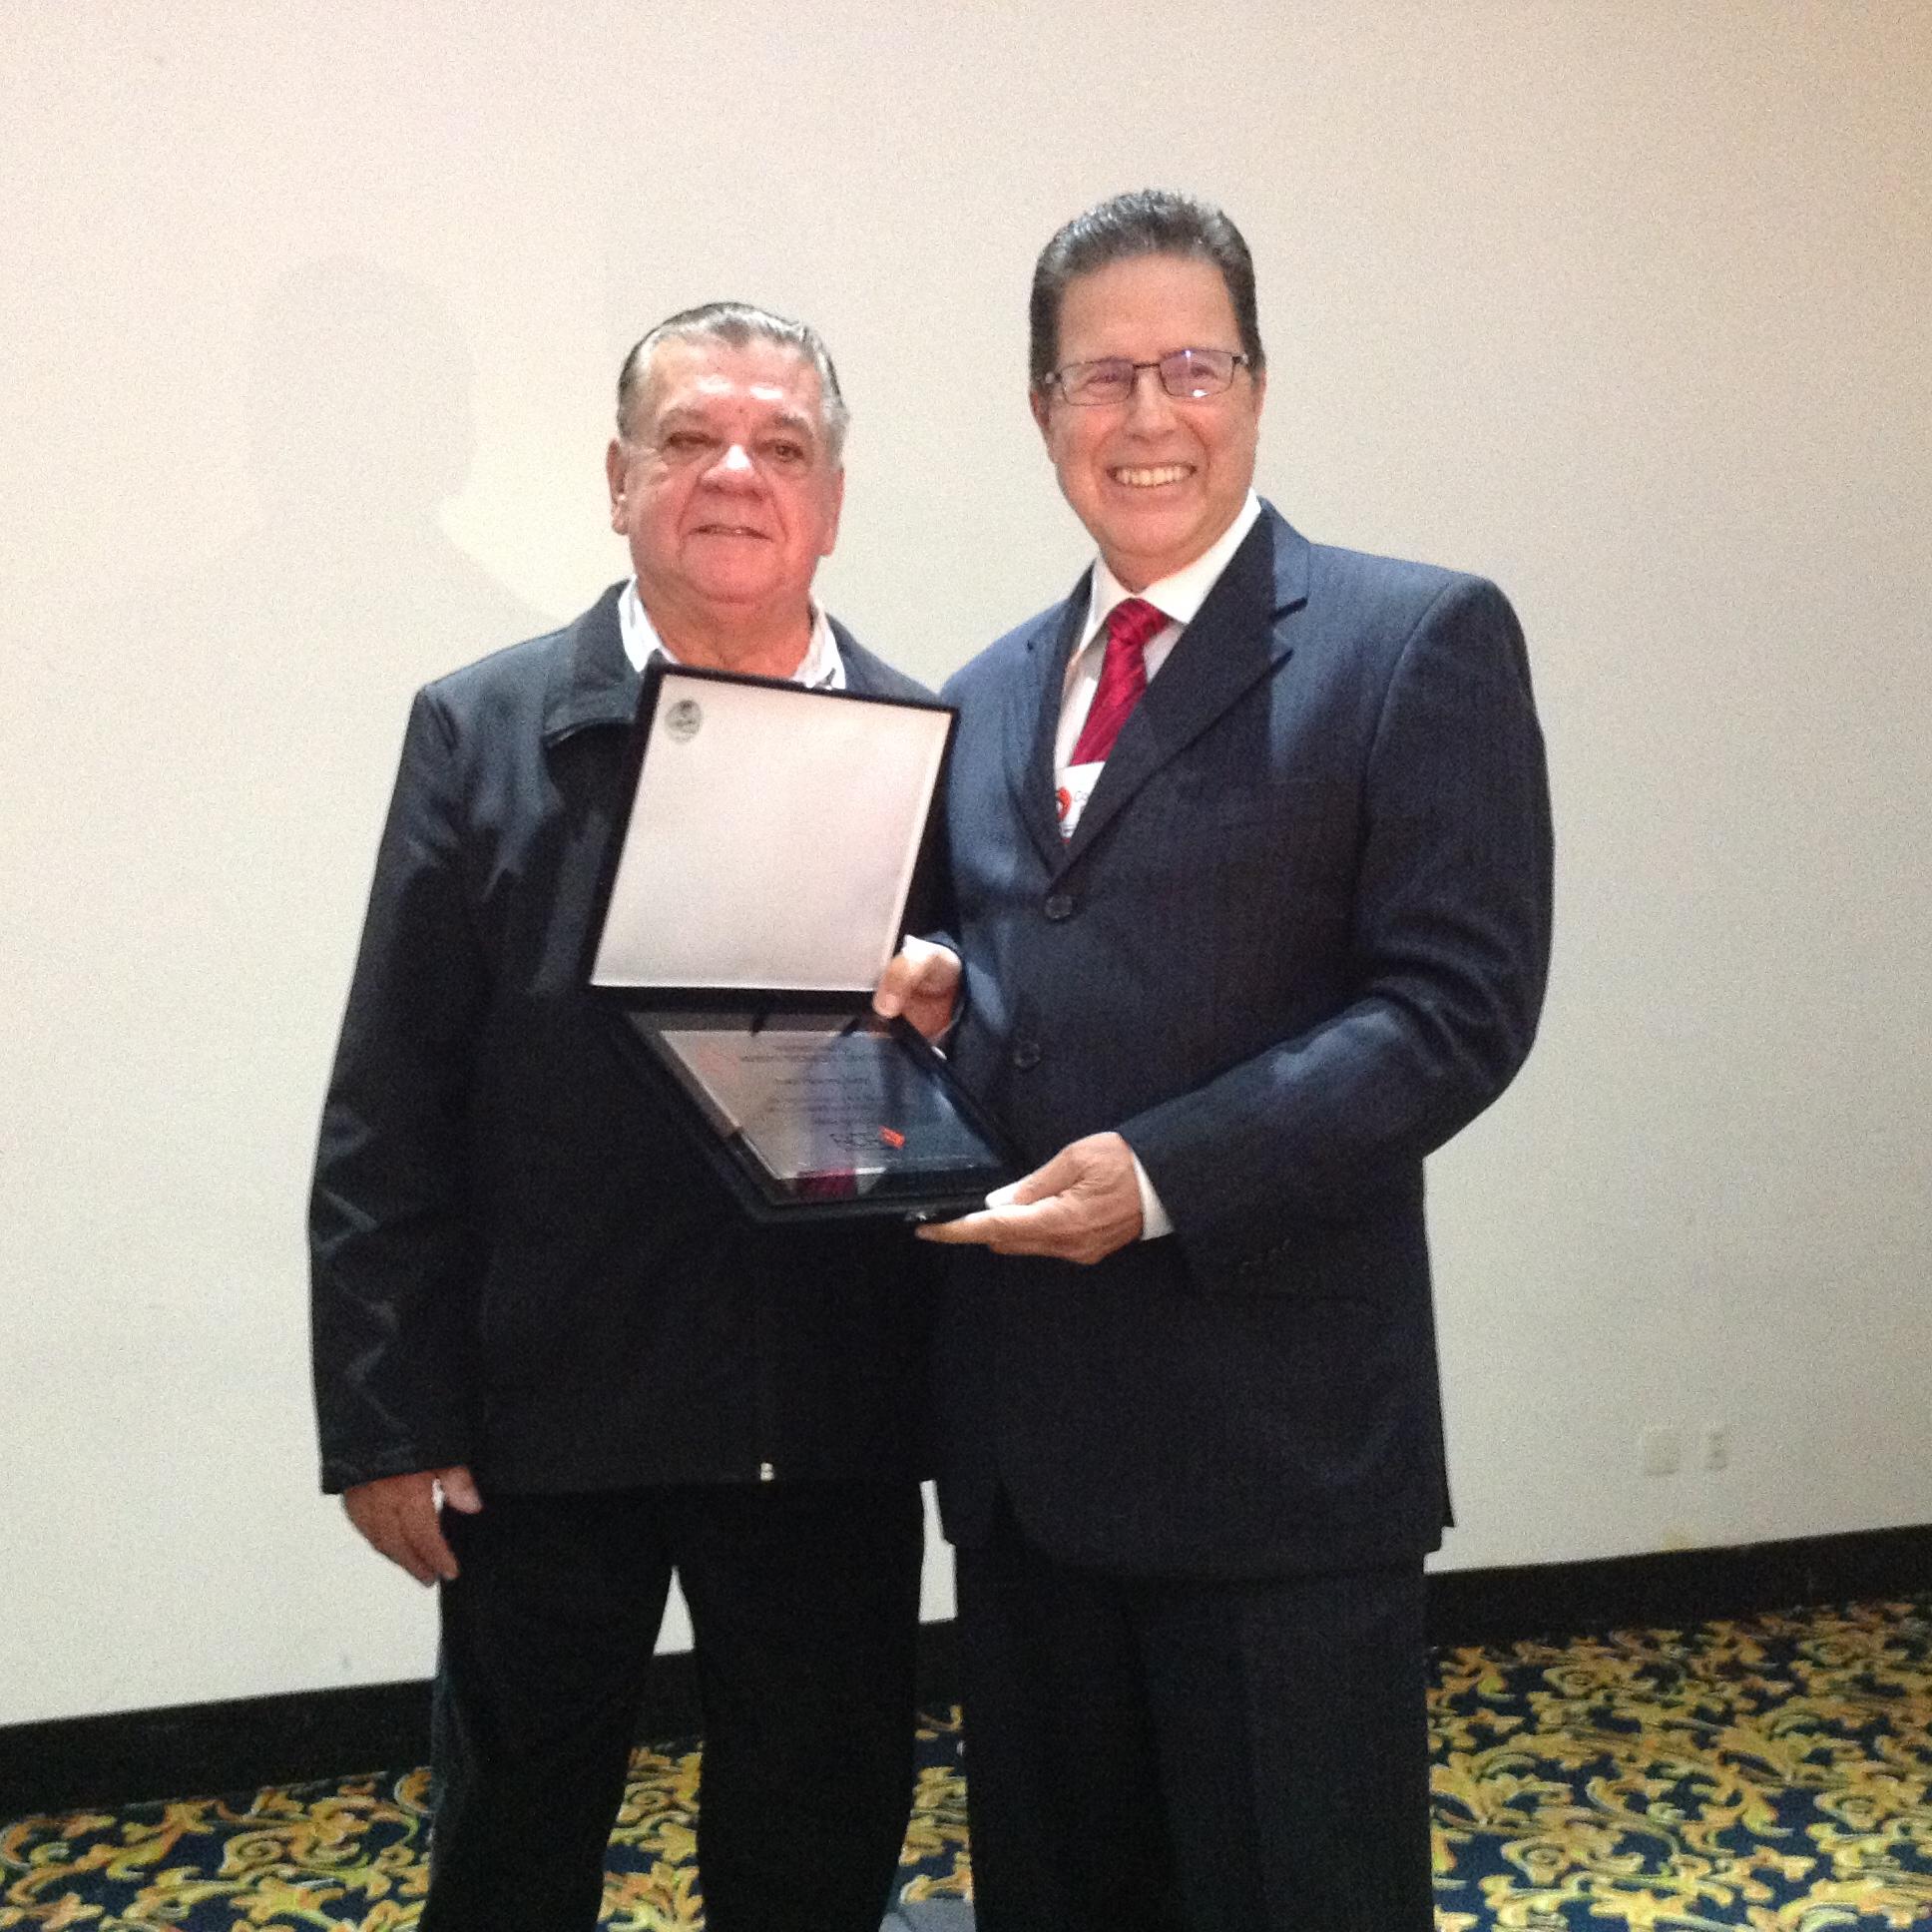 O professor recebe o Prêmio Facta 2014, entregue pelo diretor-executivo do Sindicato Nacional da Indústria de Produtos para Saúde Animal (Sindan), Milson Pereira